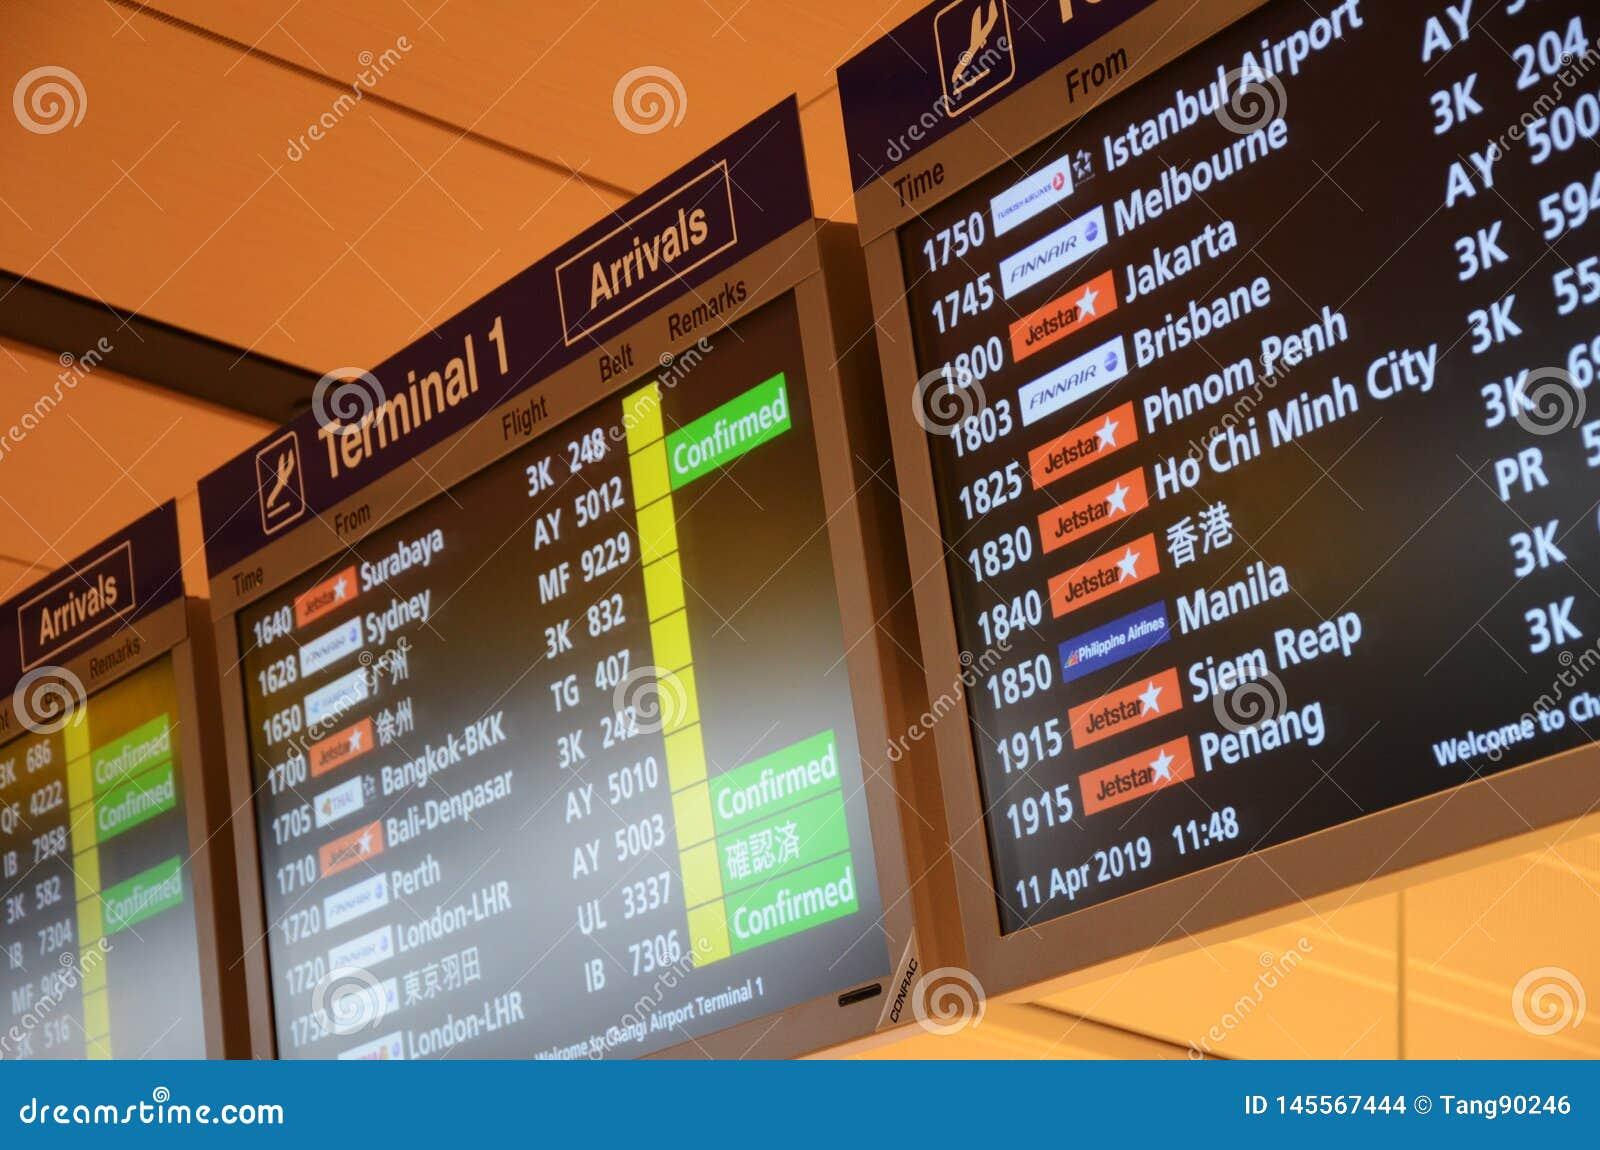 Placa da chegada no aeroporto de Changi